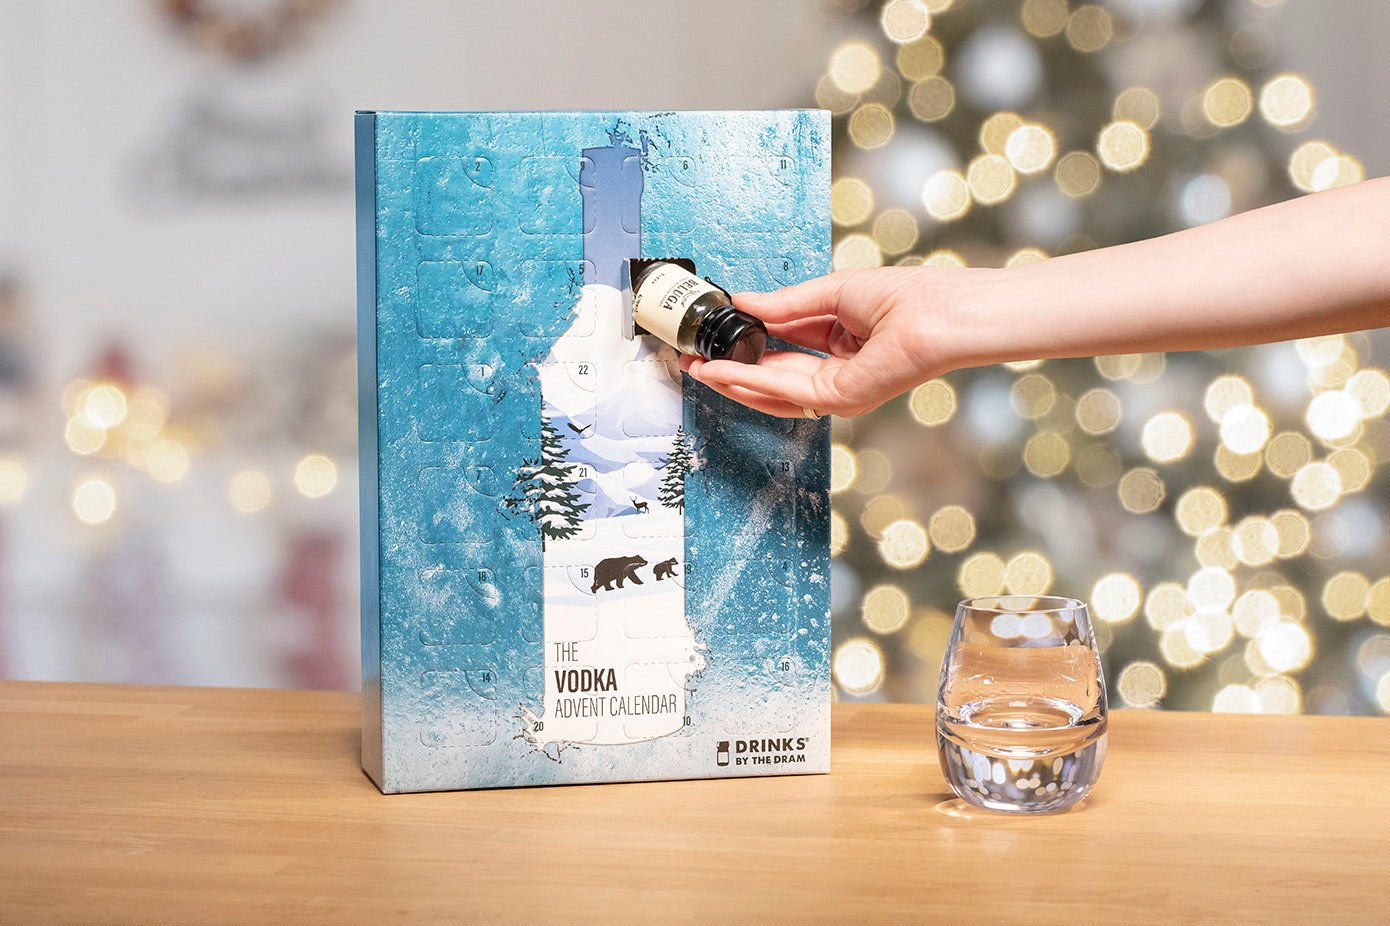 advent-calendar-vodka-drink-polar-hygge